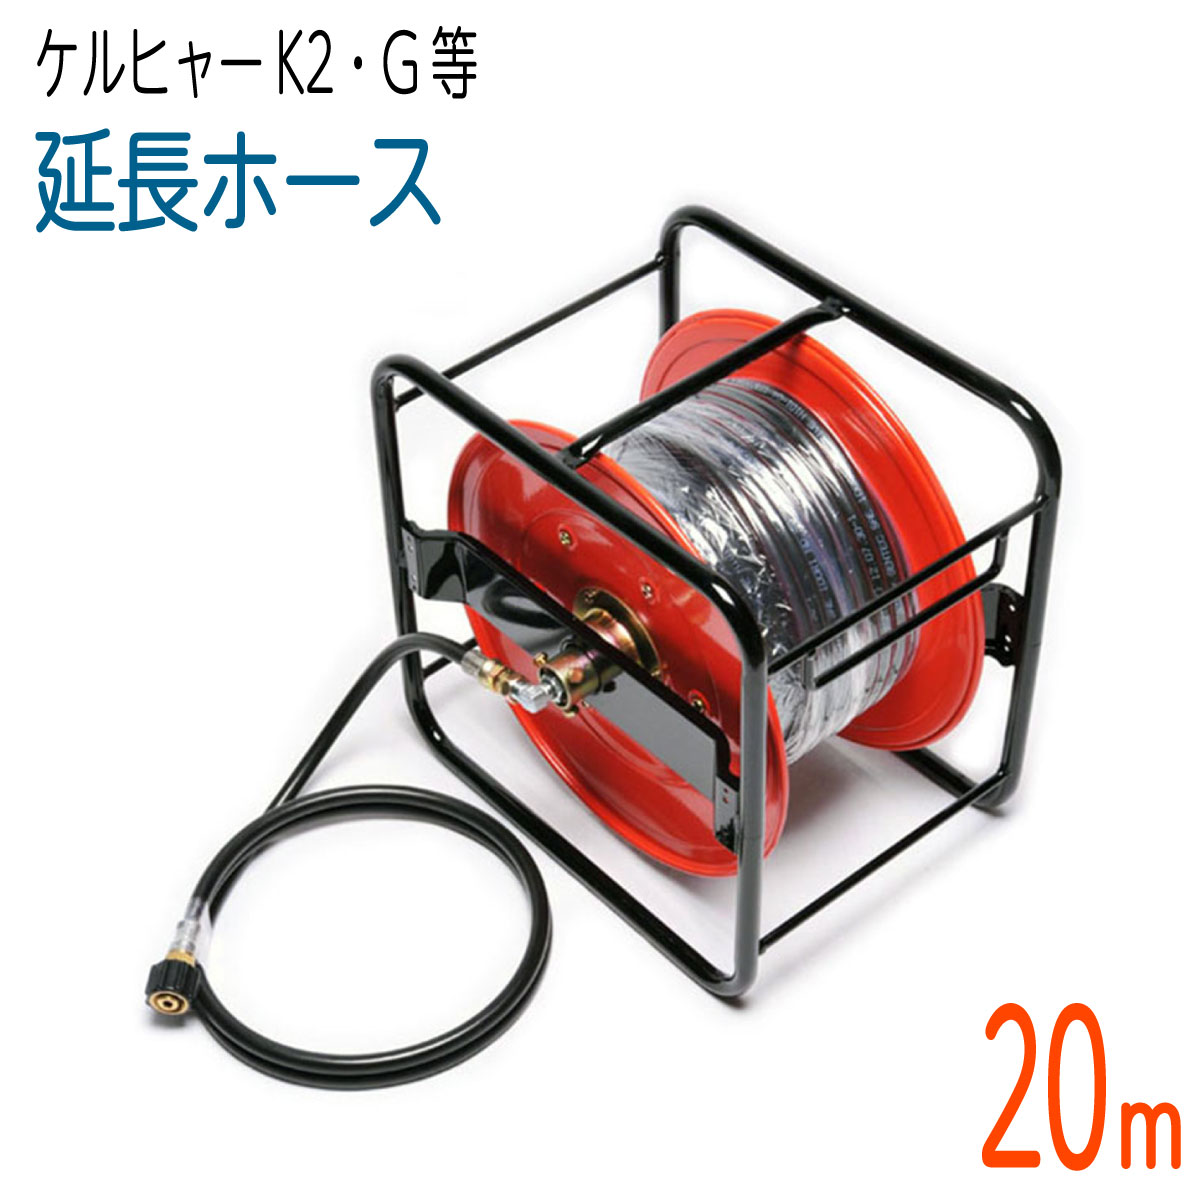 【20Mリール巻き】 ケルヒャー Kシリーズ 互換 延長 高圧洗浄機ホース コンパクトホース